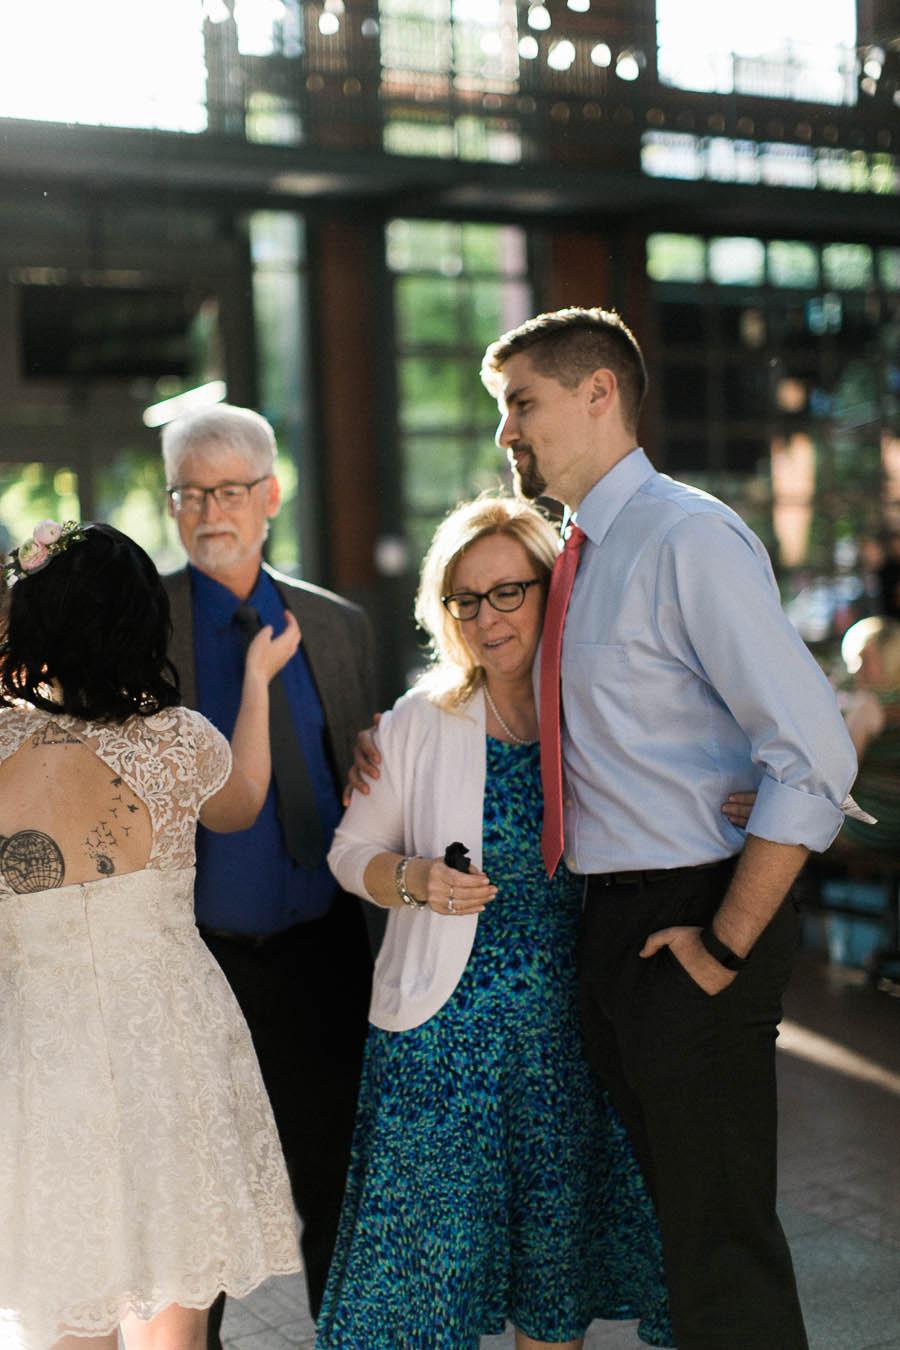 chattanooga film wedding photographer documentary natural gentle real life ©2016abigailbobophotography-56.jpg